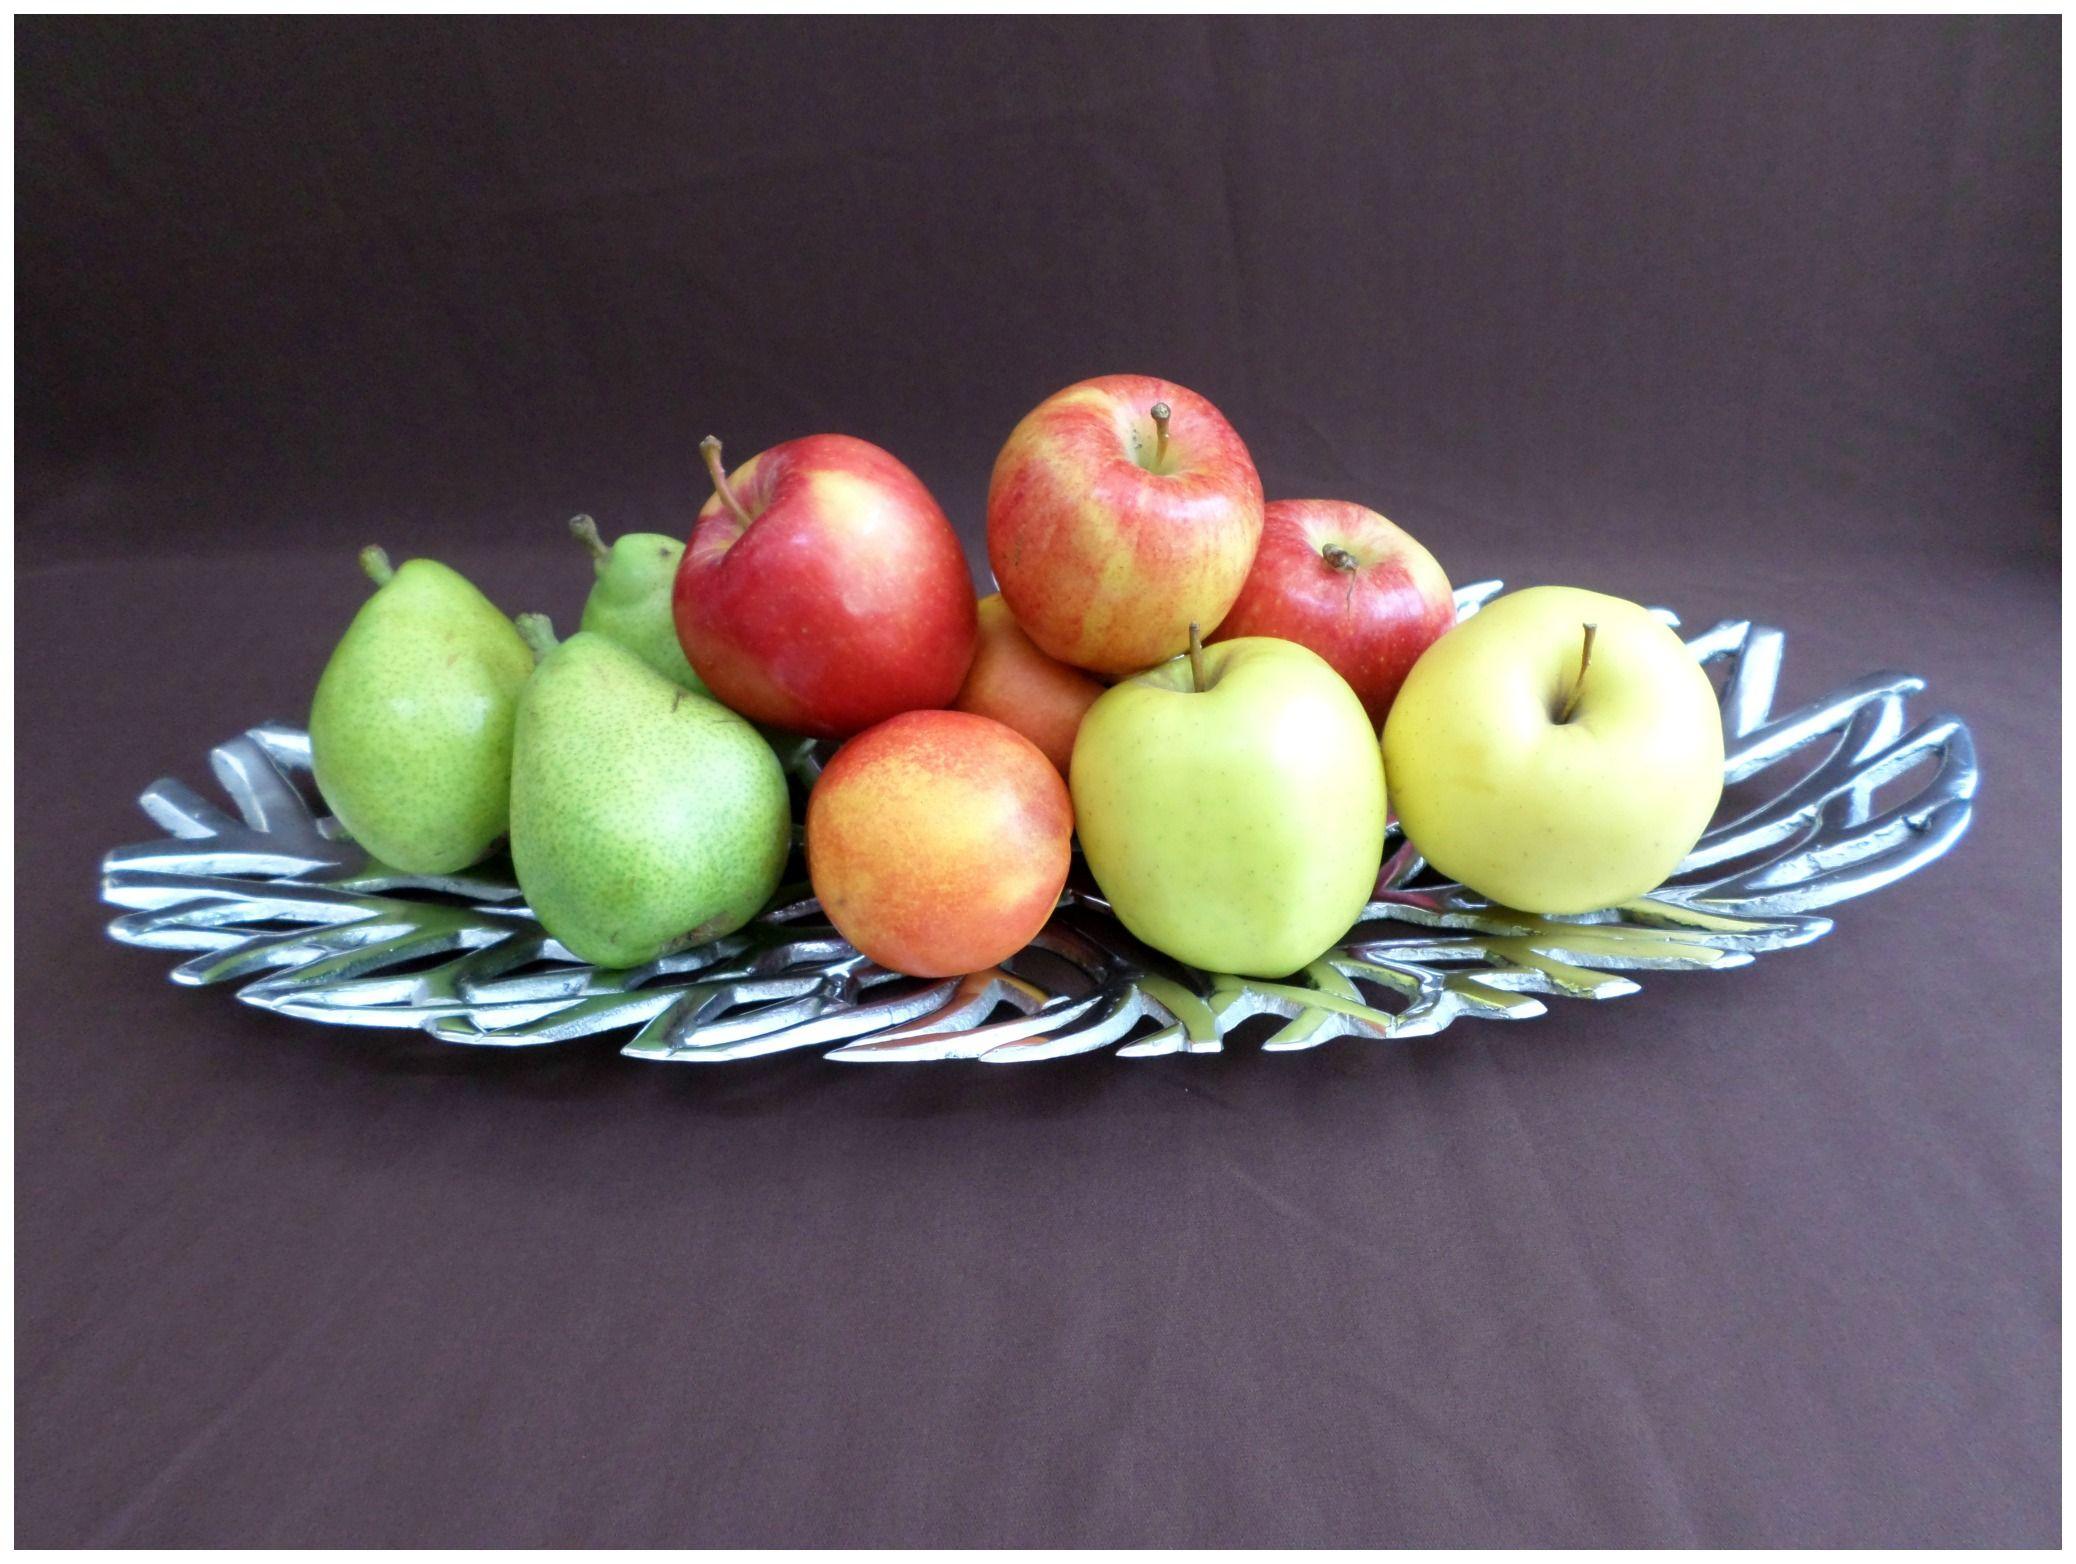 Pewter pewter frutero fruits frutas adorno mesa for Mesa cocina frutero